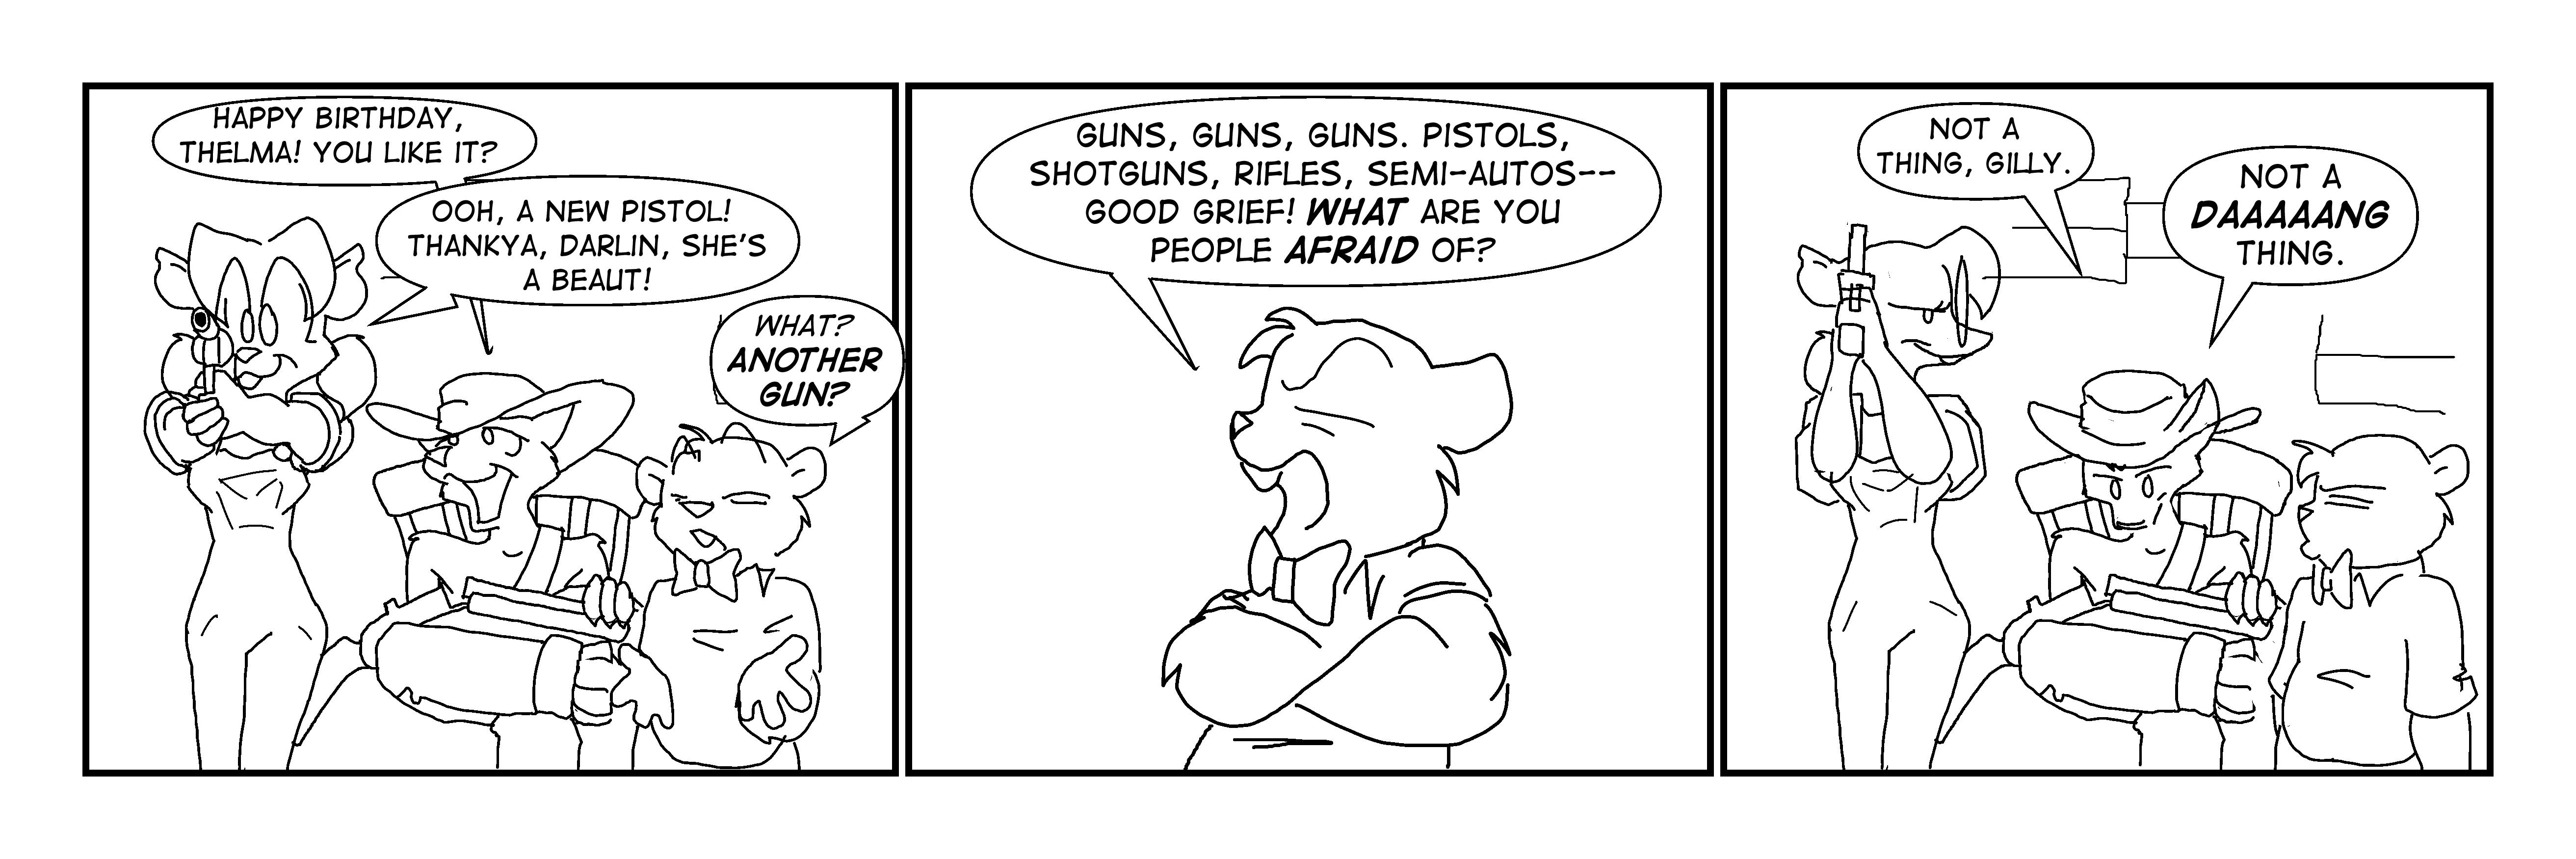 00973